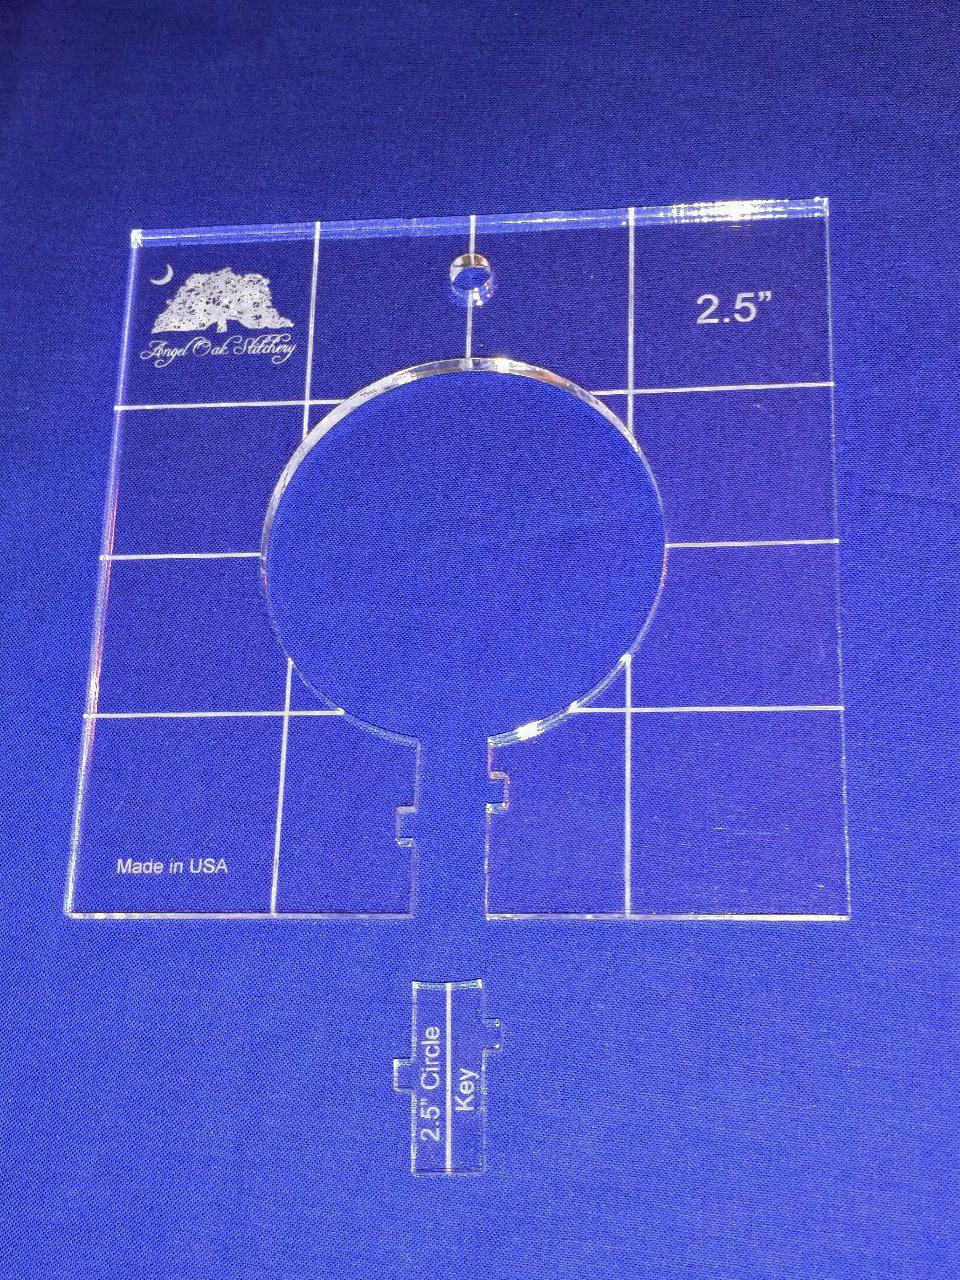 2-1/2 inch Circle Rulerwork Quilting Template